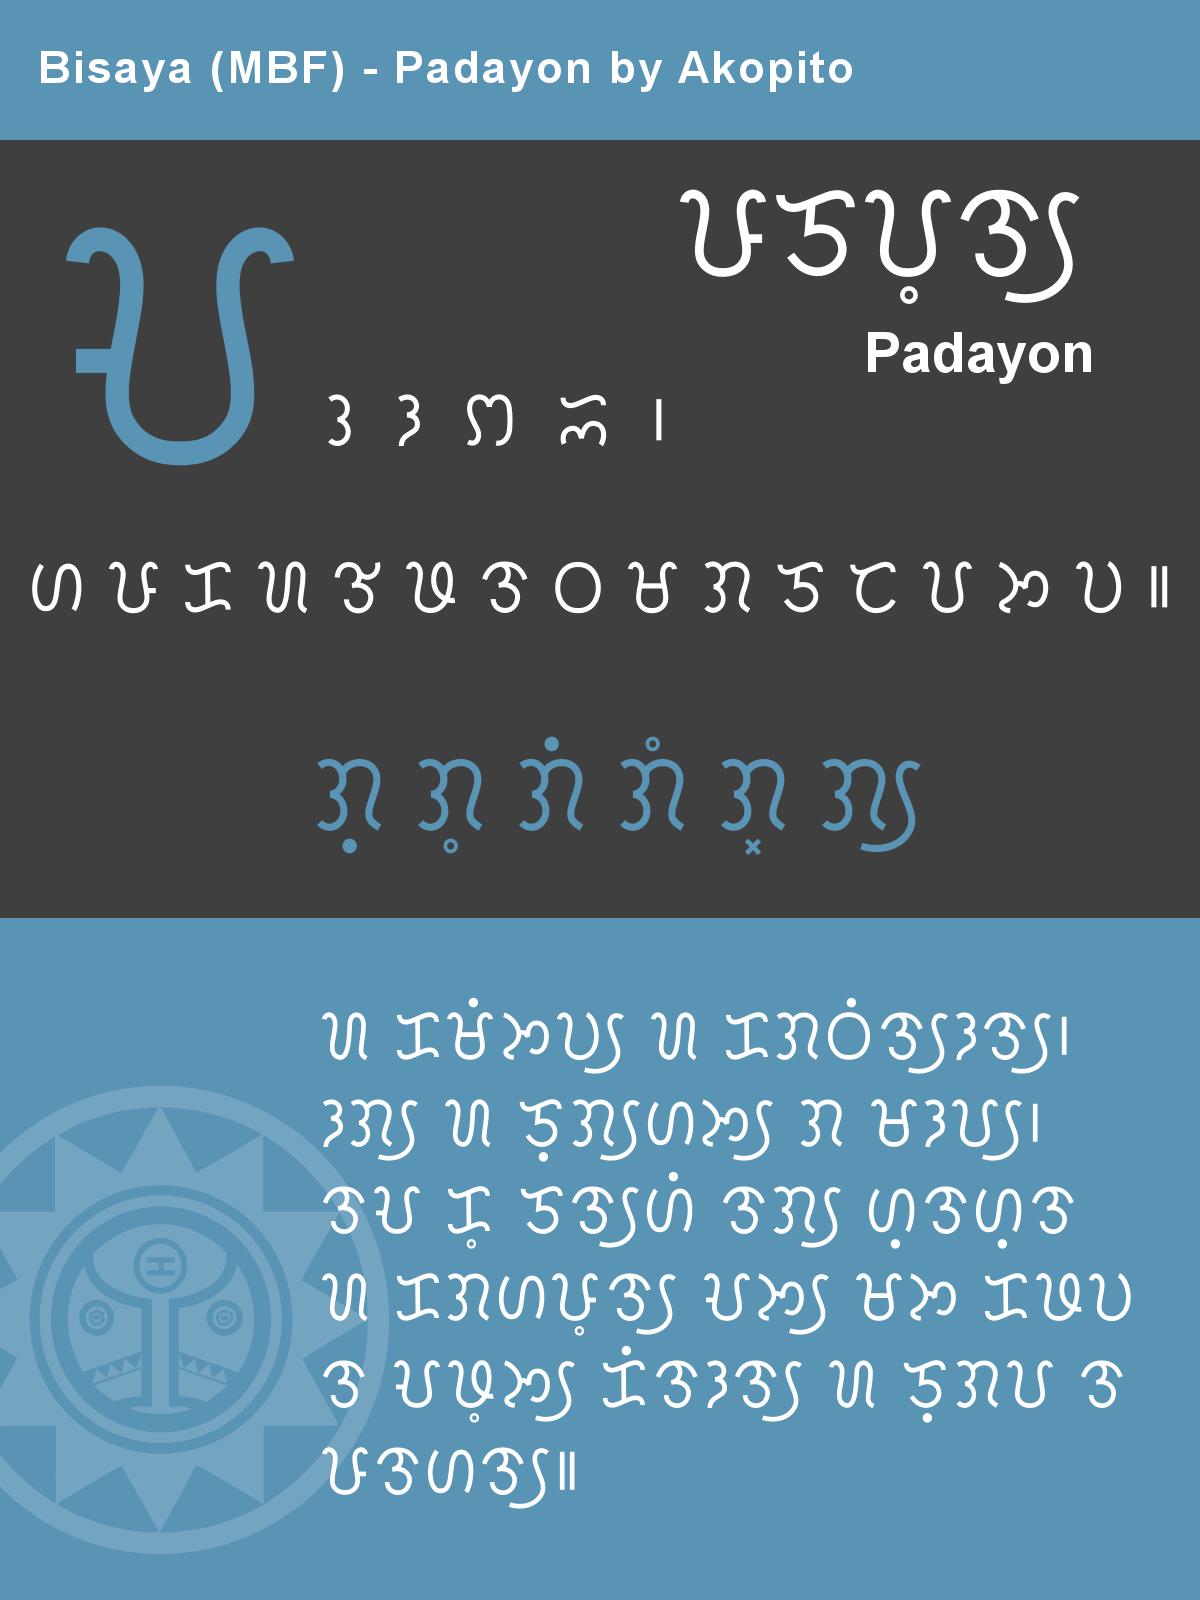 Bisaya Modern Badlit Font - Padayon by Akopito